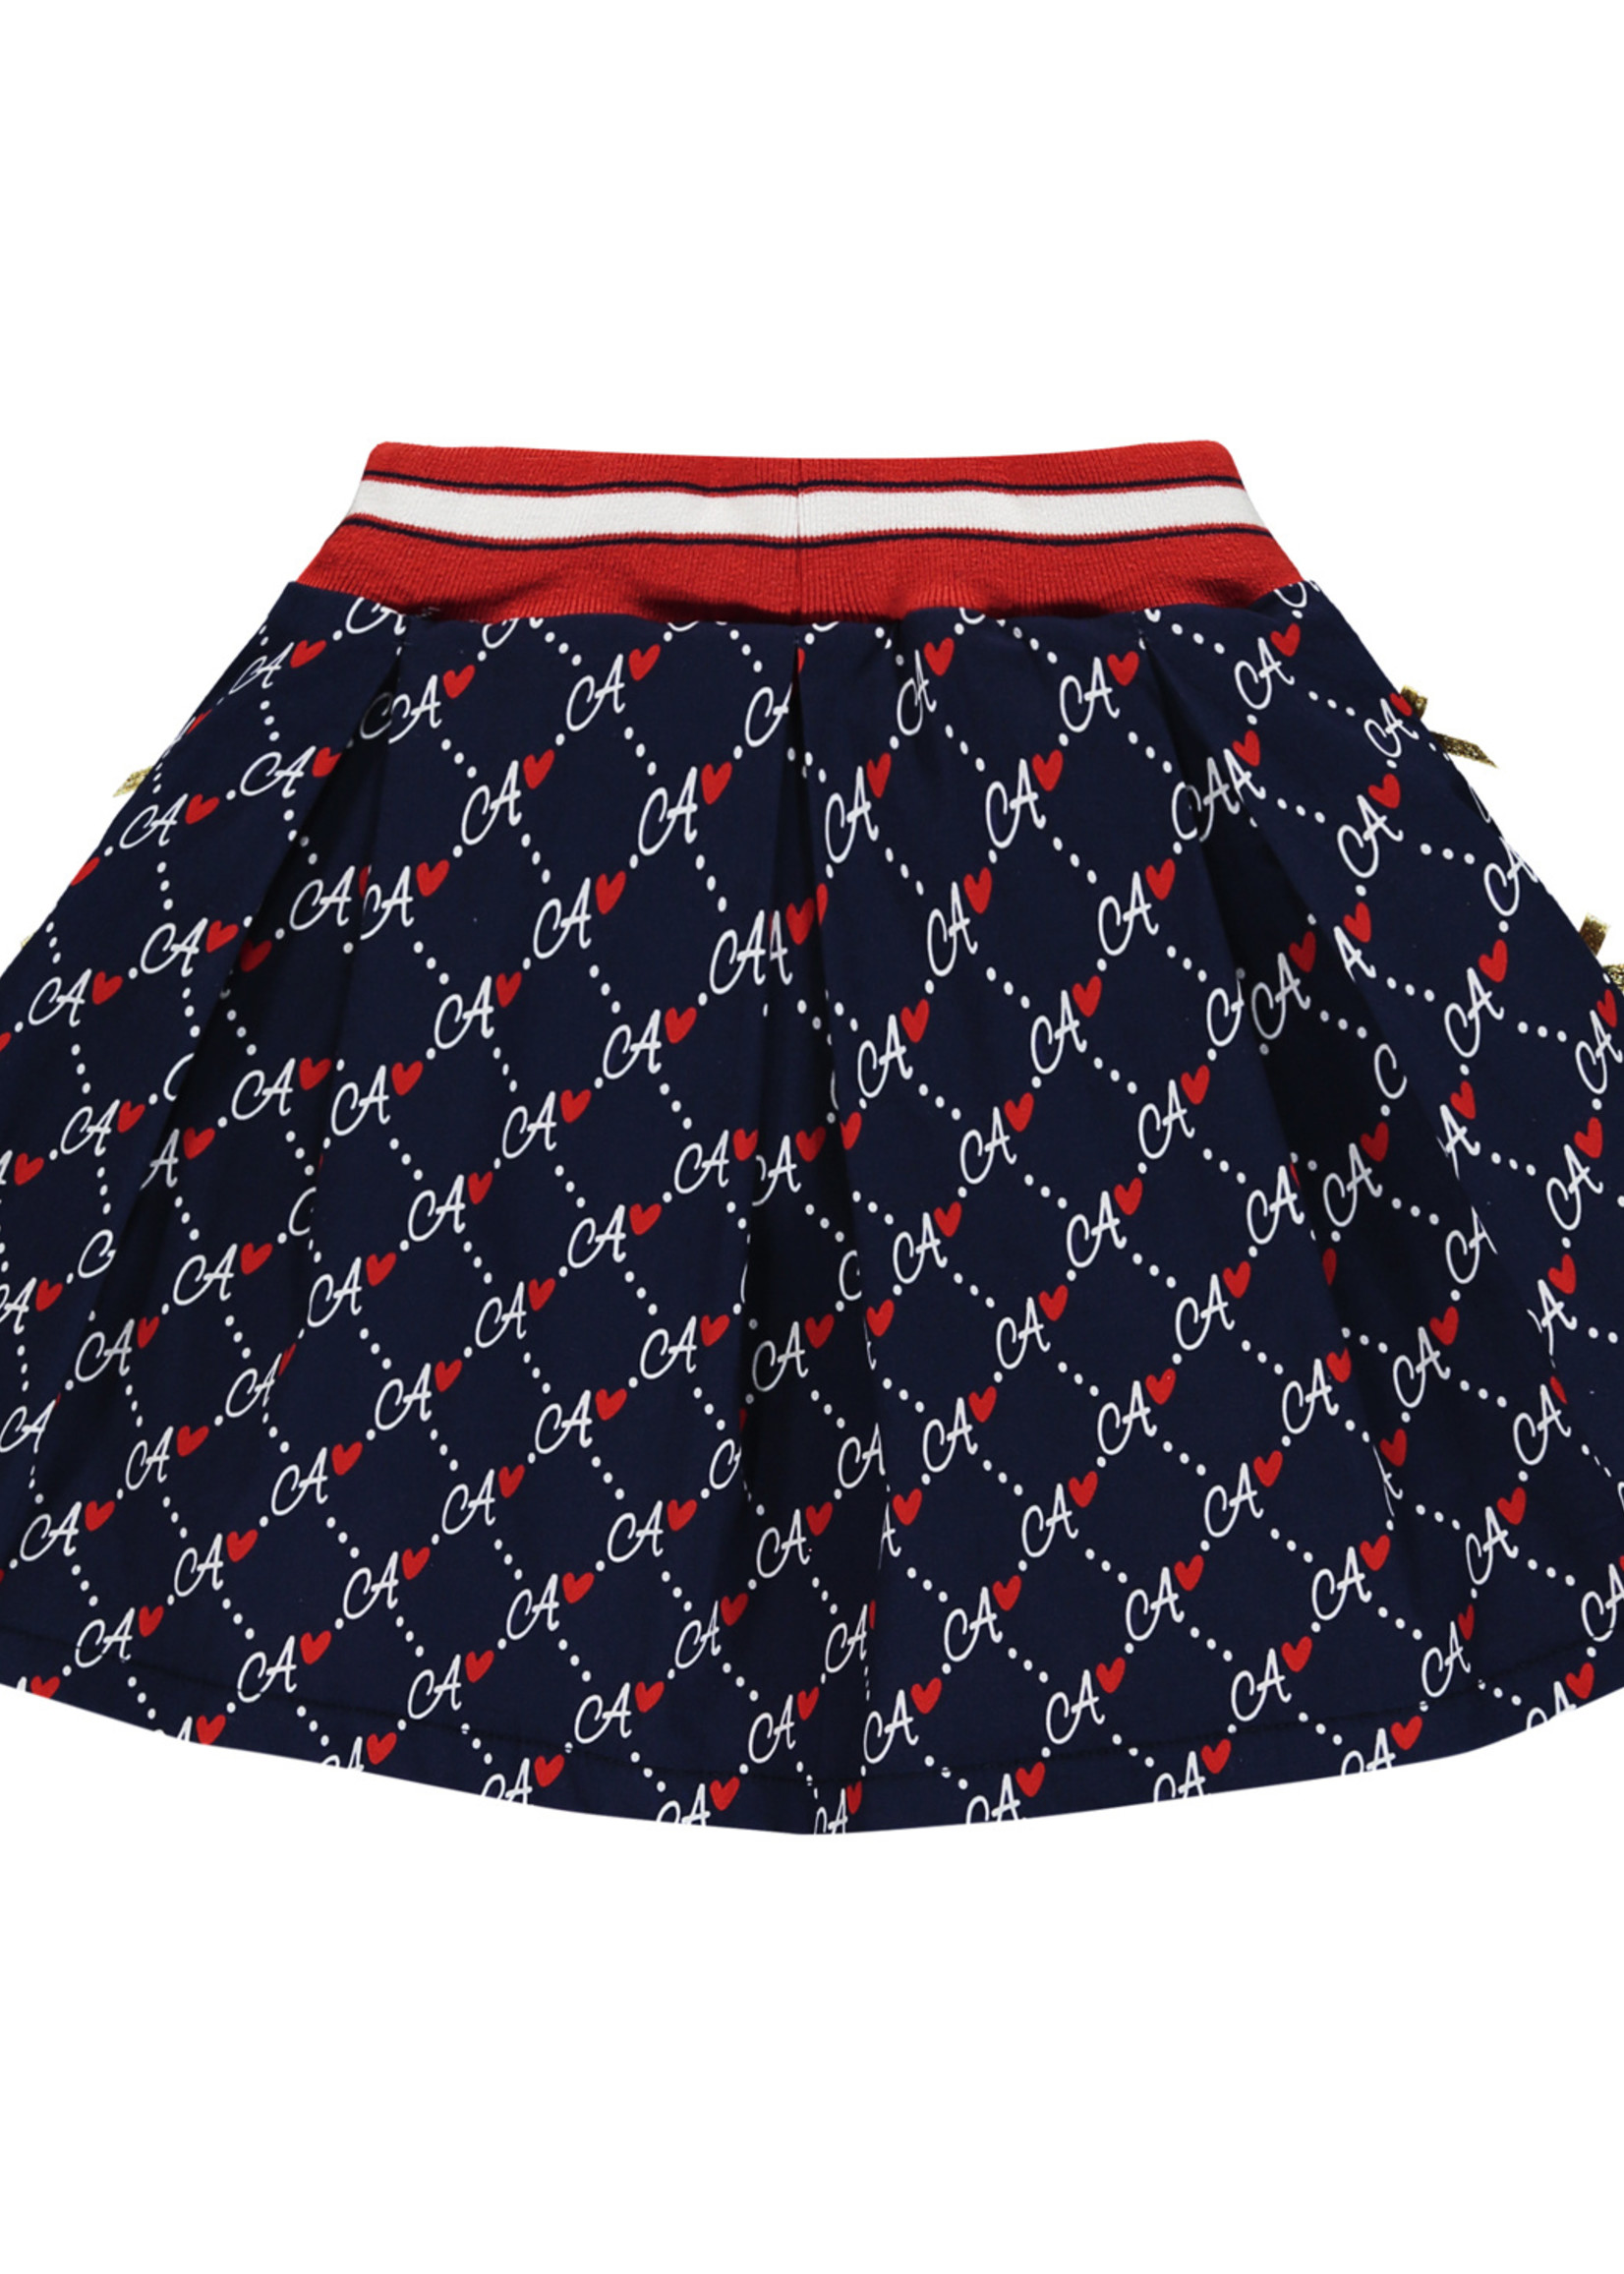 A Dee Madison Diamond print skirt